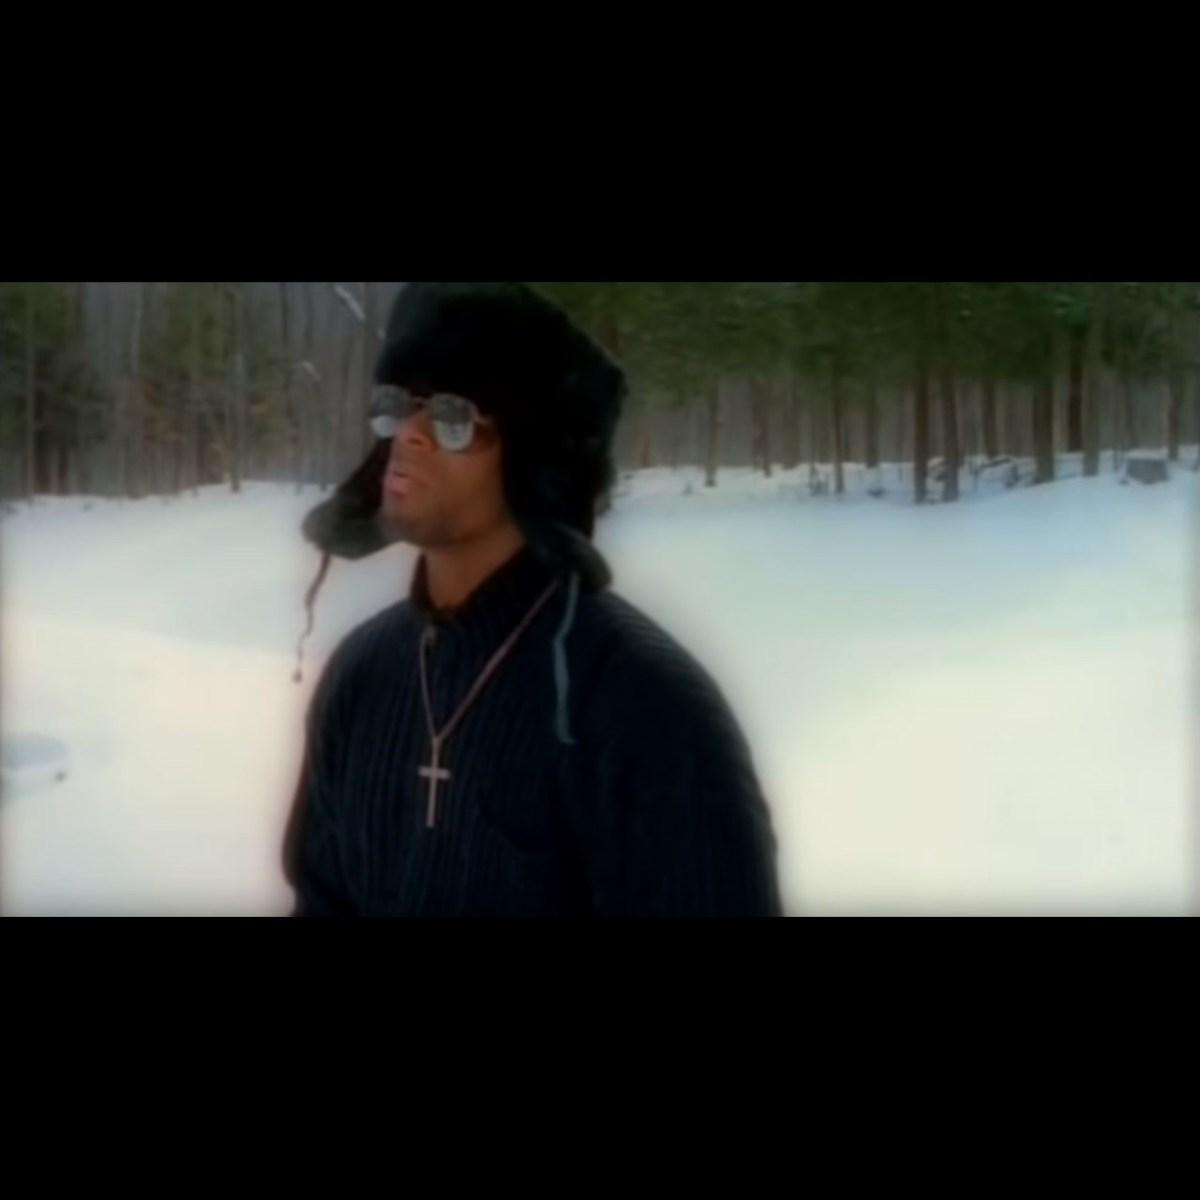 R. Kelly - I Can't Sleep Baby (If I) (Thumbnail)